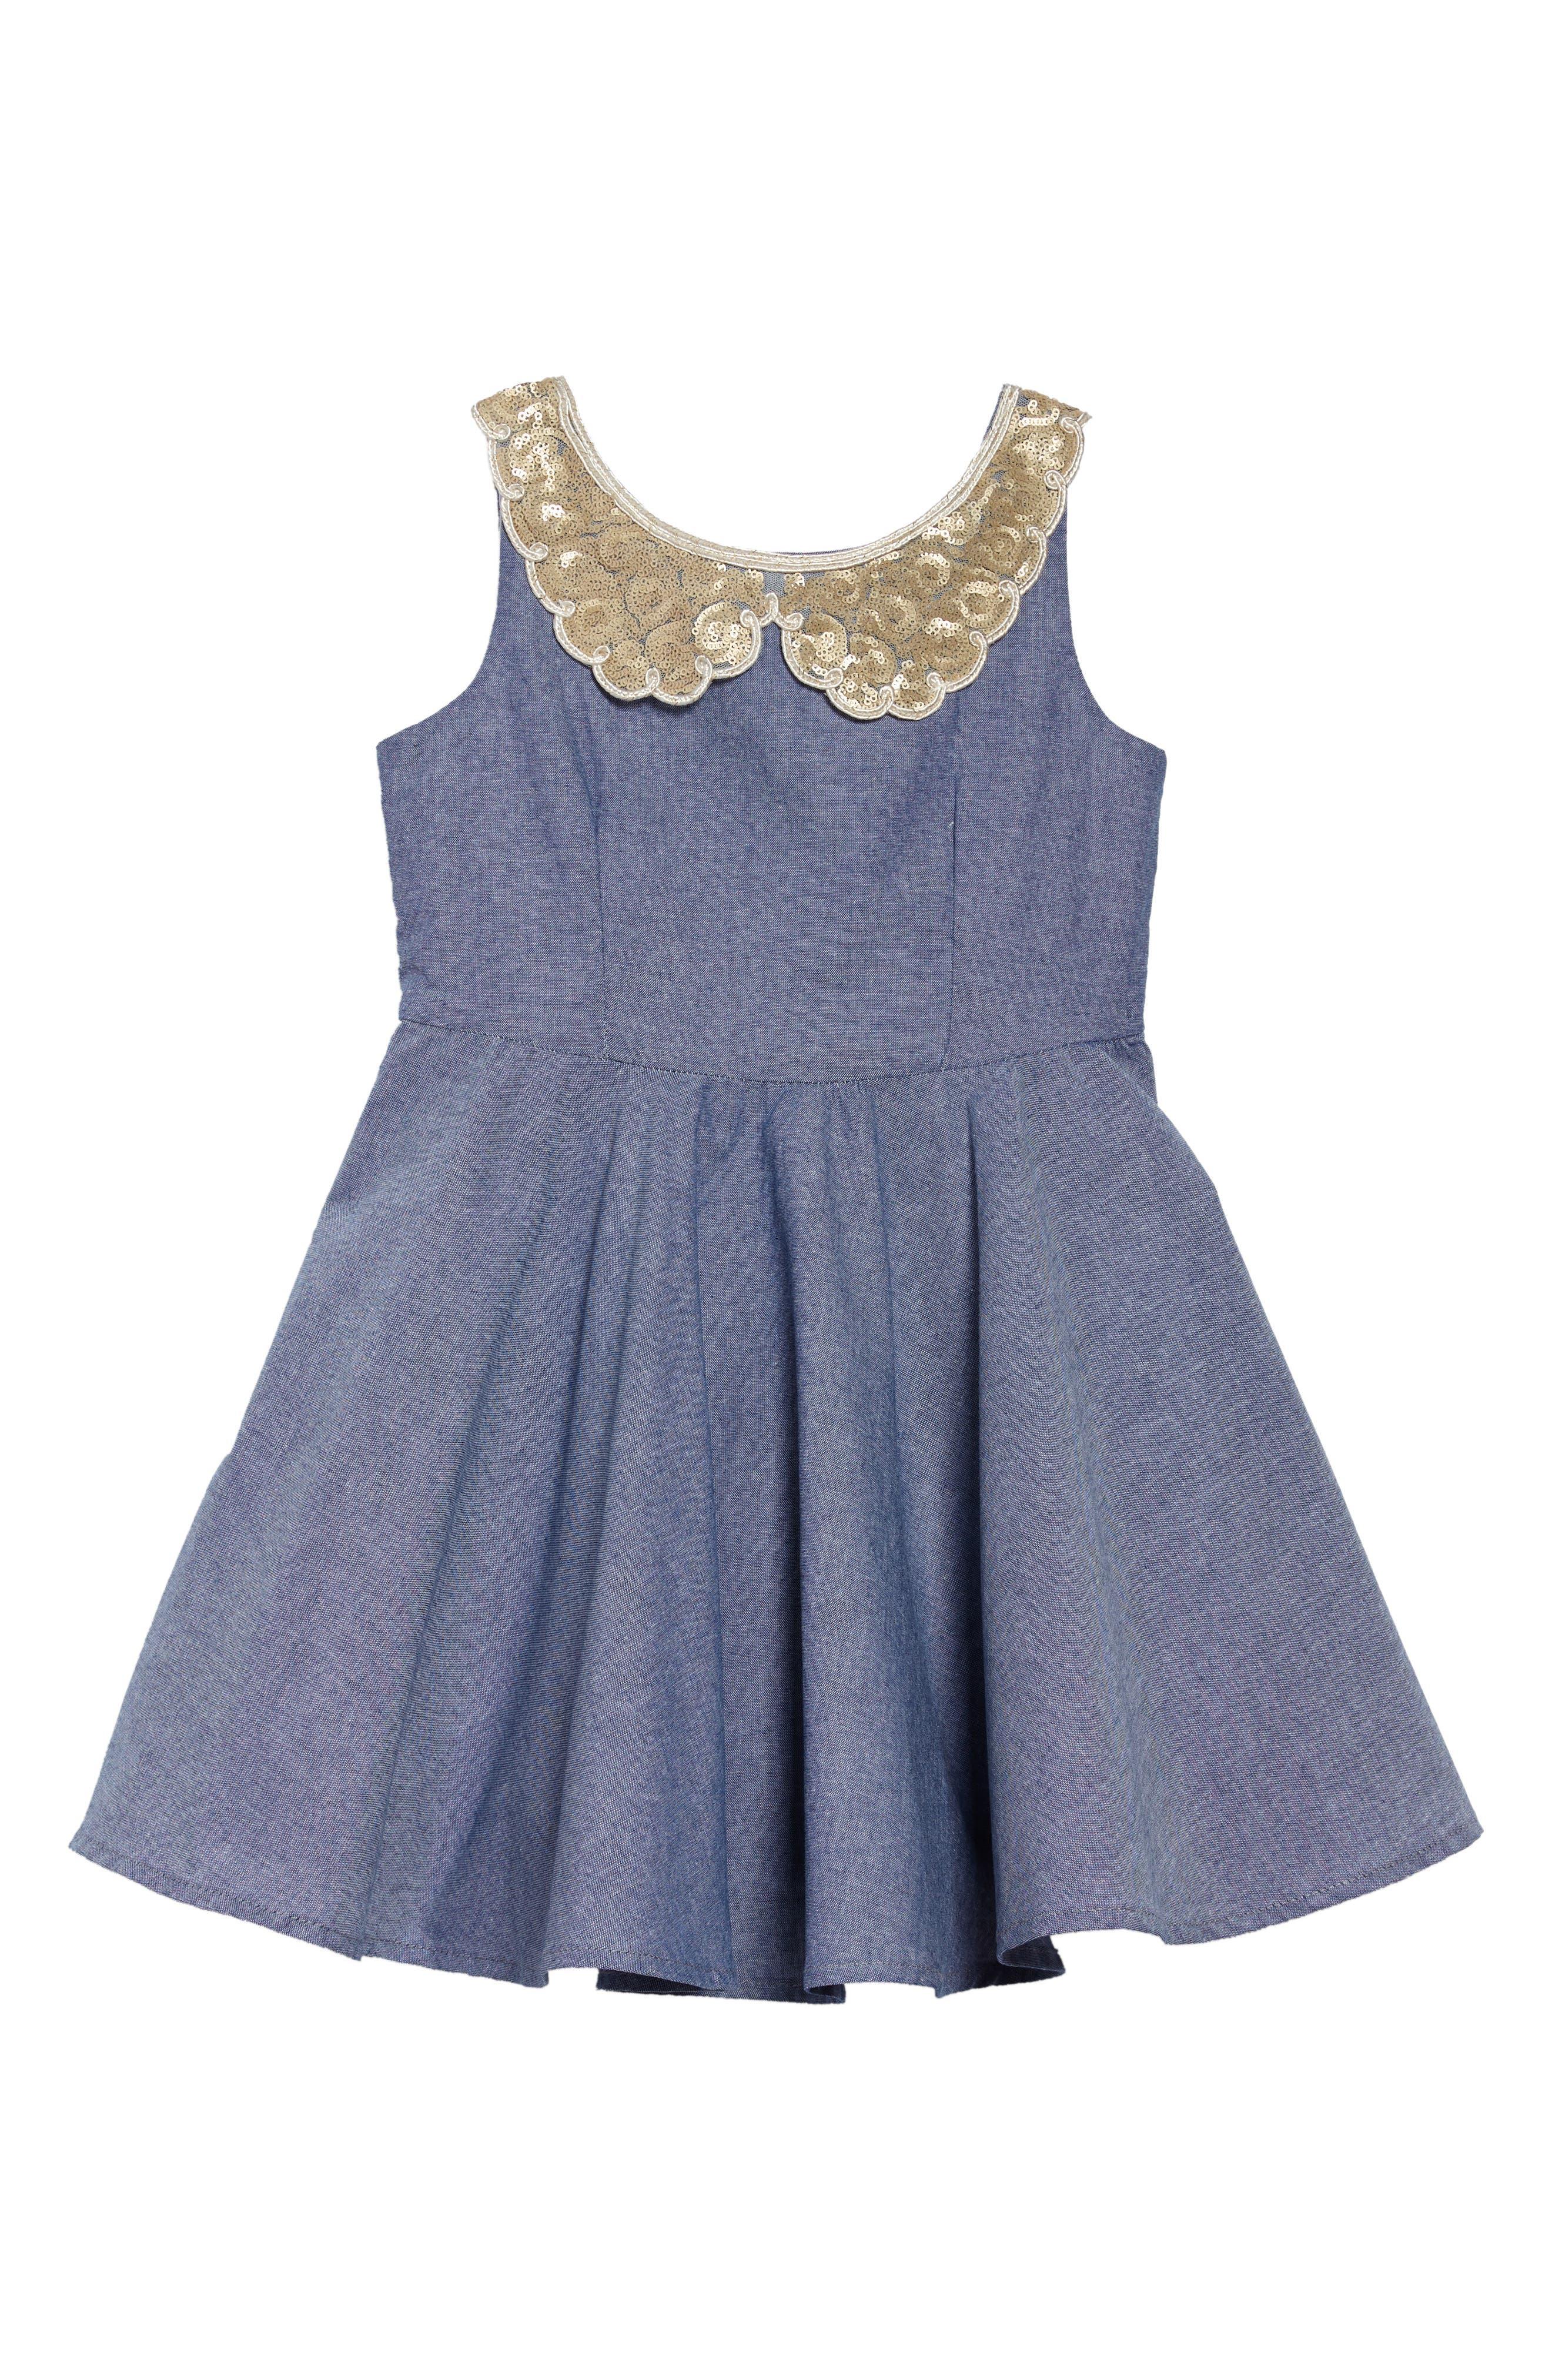 Alternate Image 1 Selected - Fiveloaves Twofish Darcy Chambray Dress (Toddler Girls, Little Girls & Big Girls)